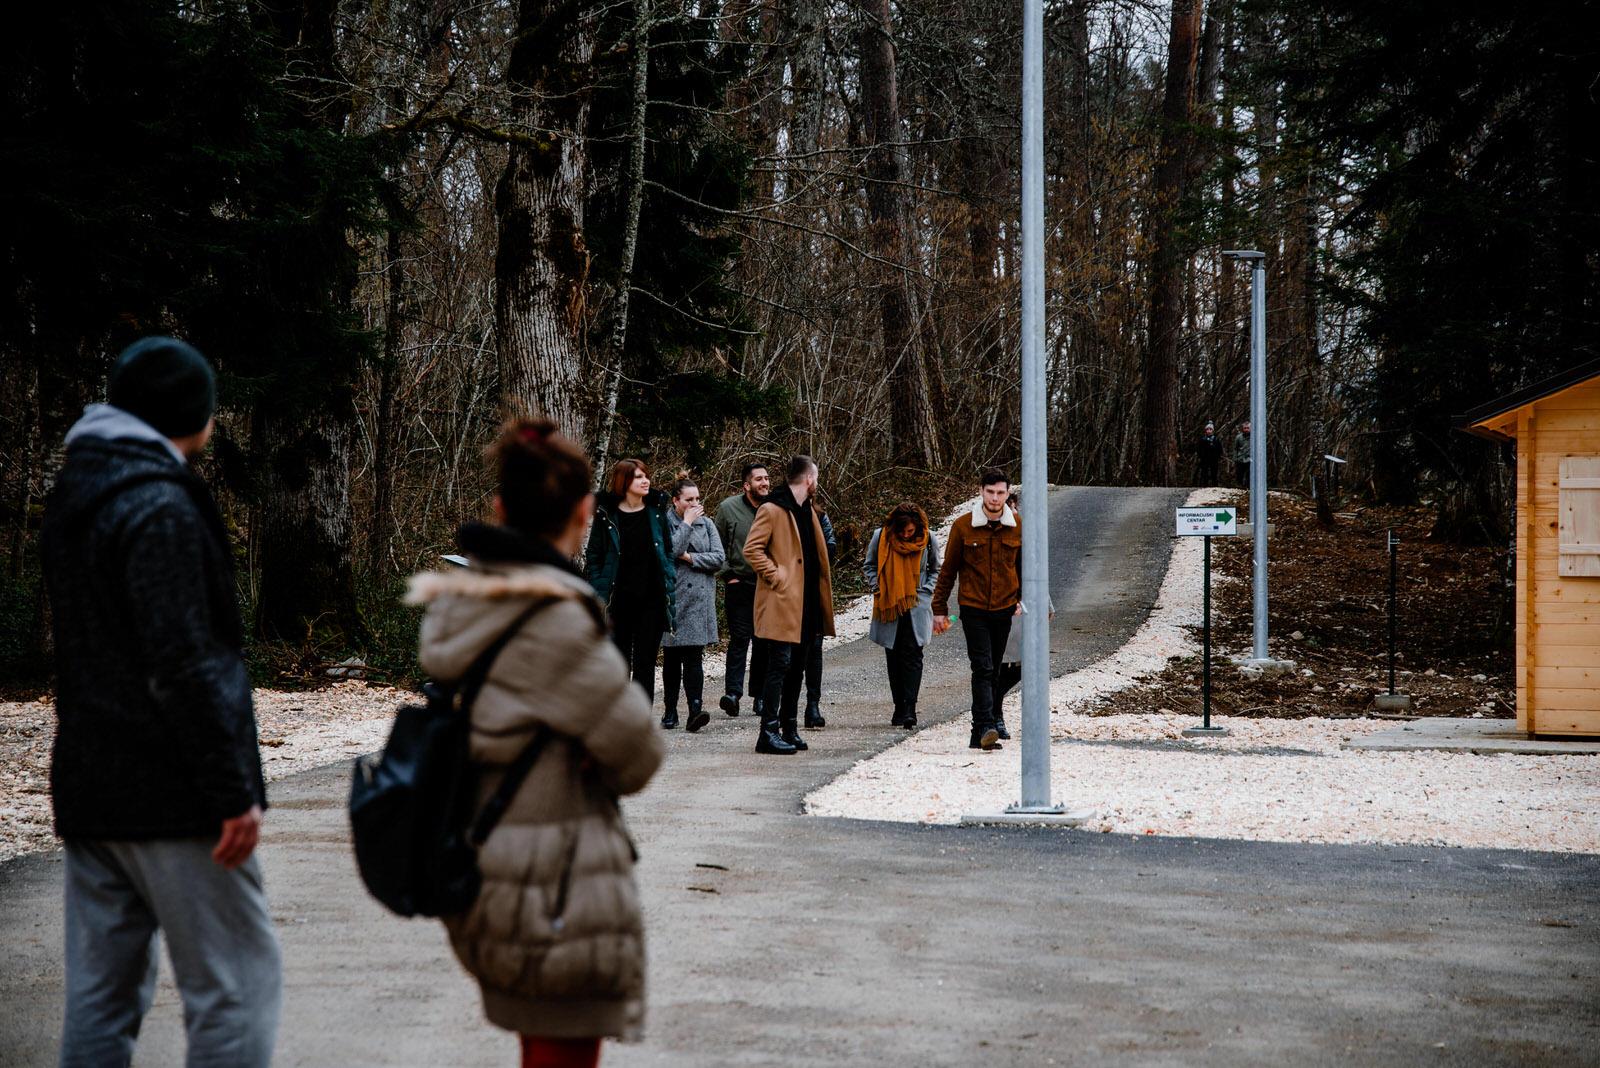 likaclub_gospić_park šuma jasikovac_projekt i video spot_2020 (16)